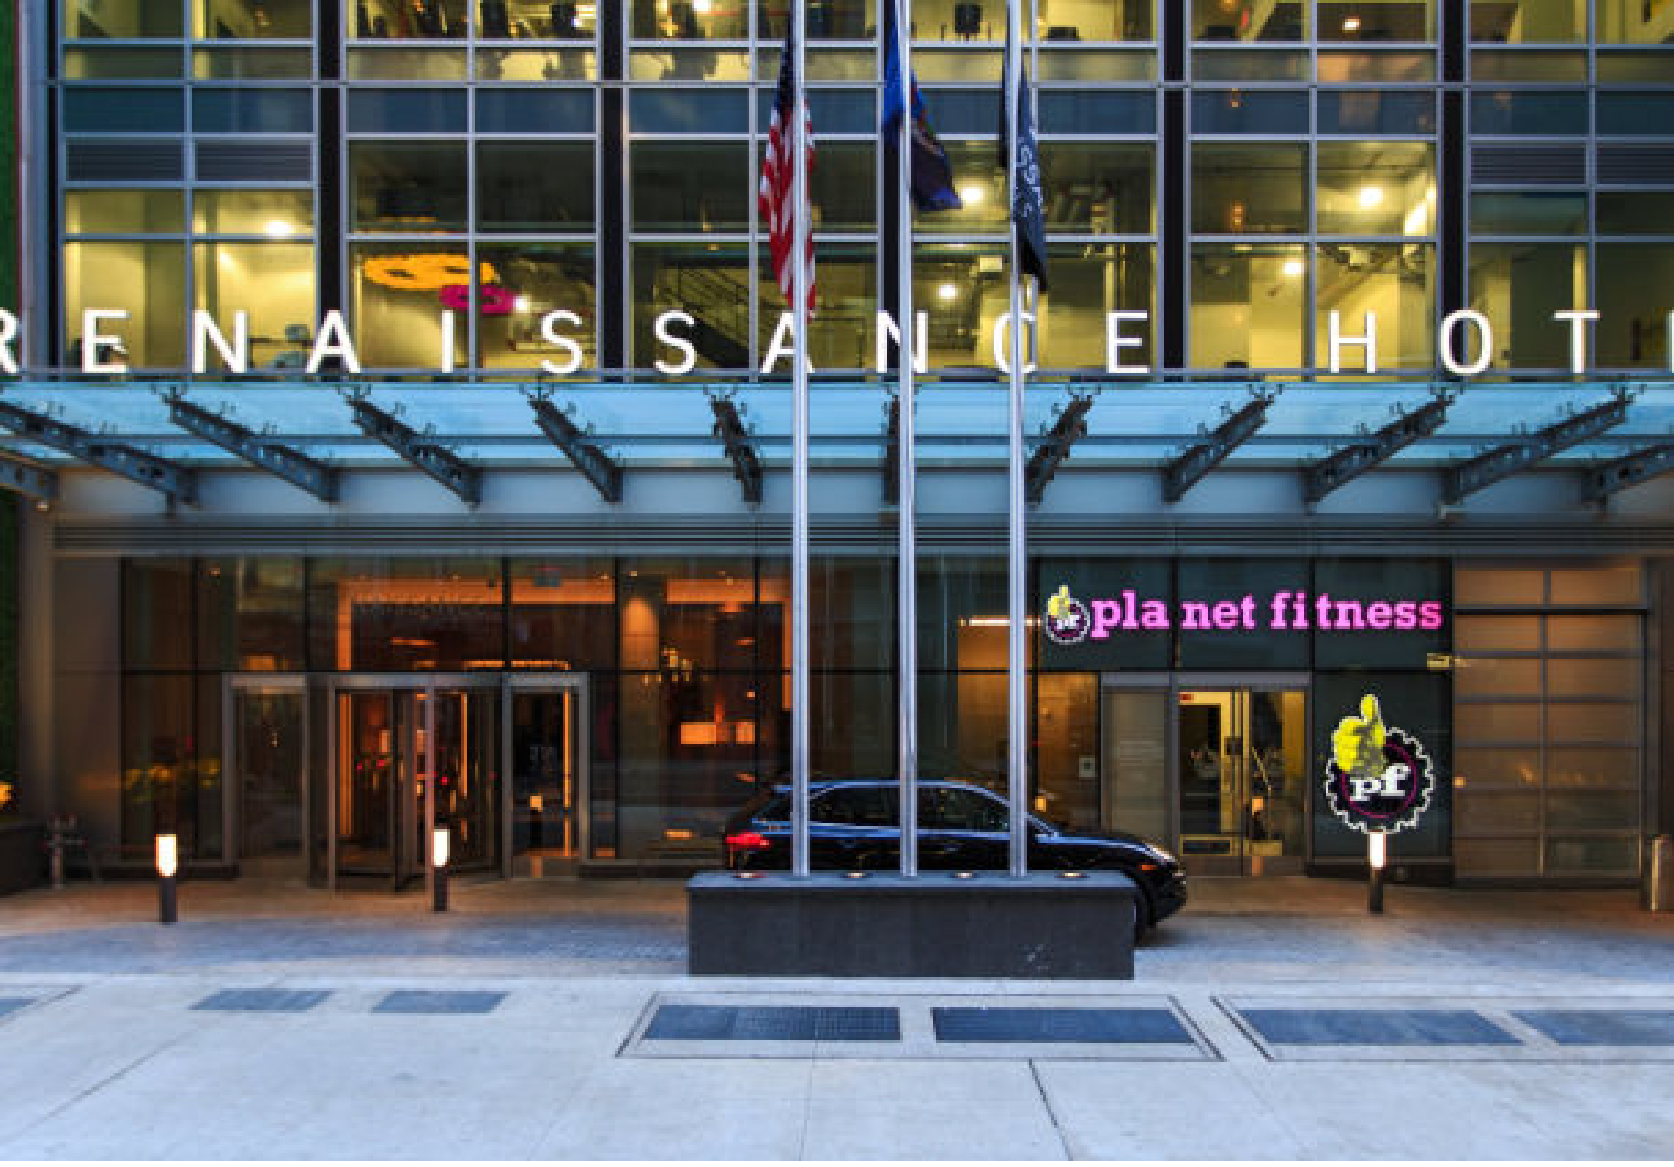 Marriott Renaissance - NYCA&H Acquisitions